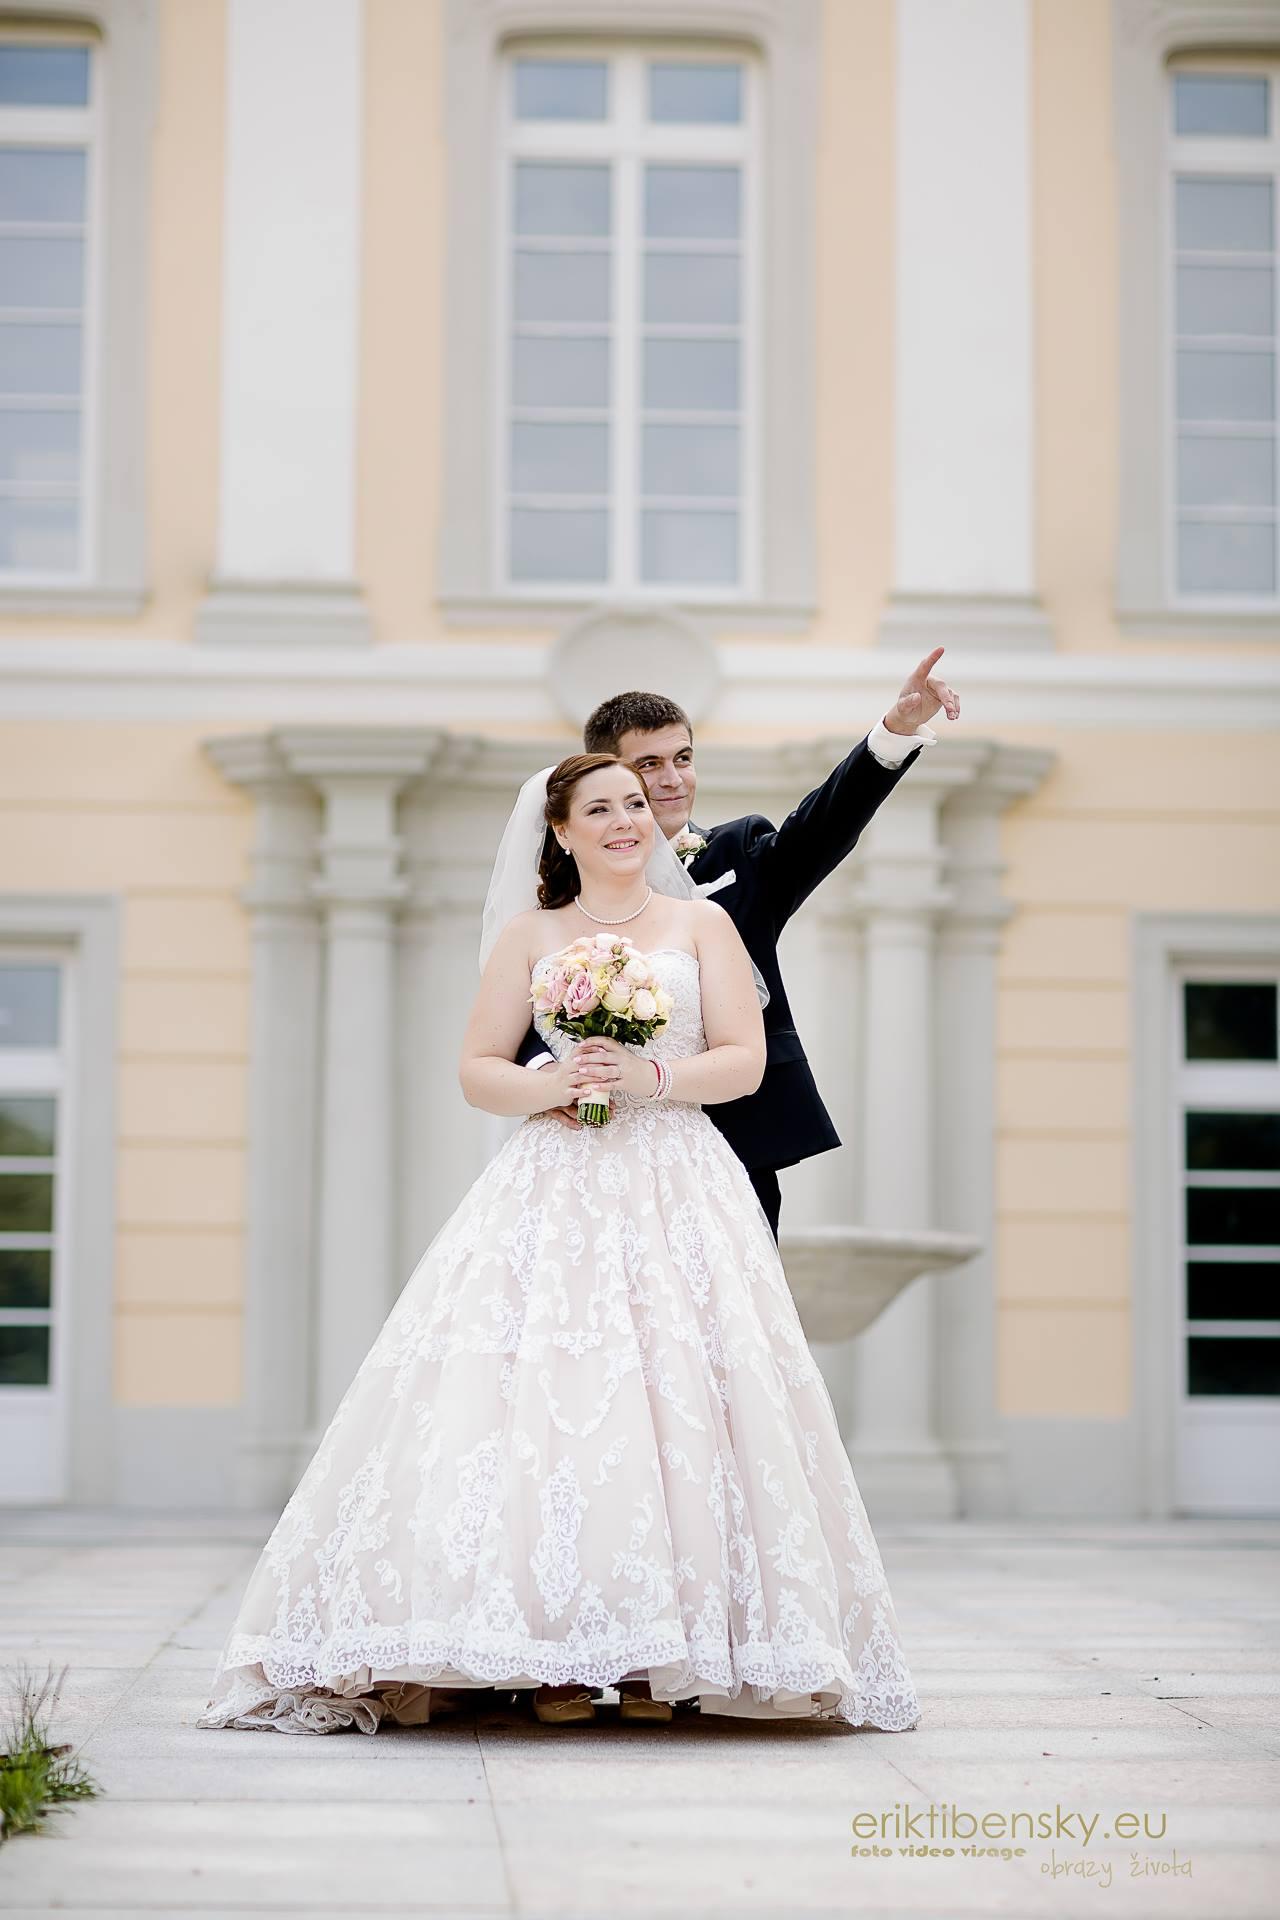 eriktibensky-eu-svadobny-fotograf-wedding-photographer-3074